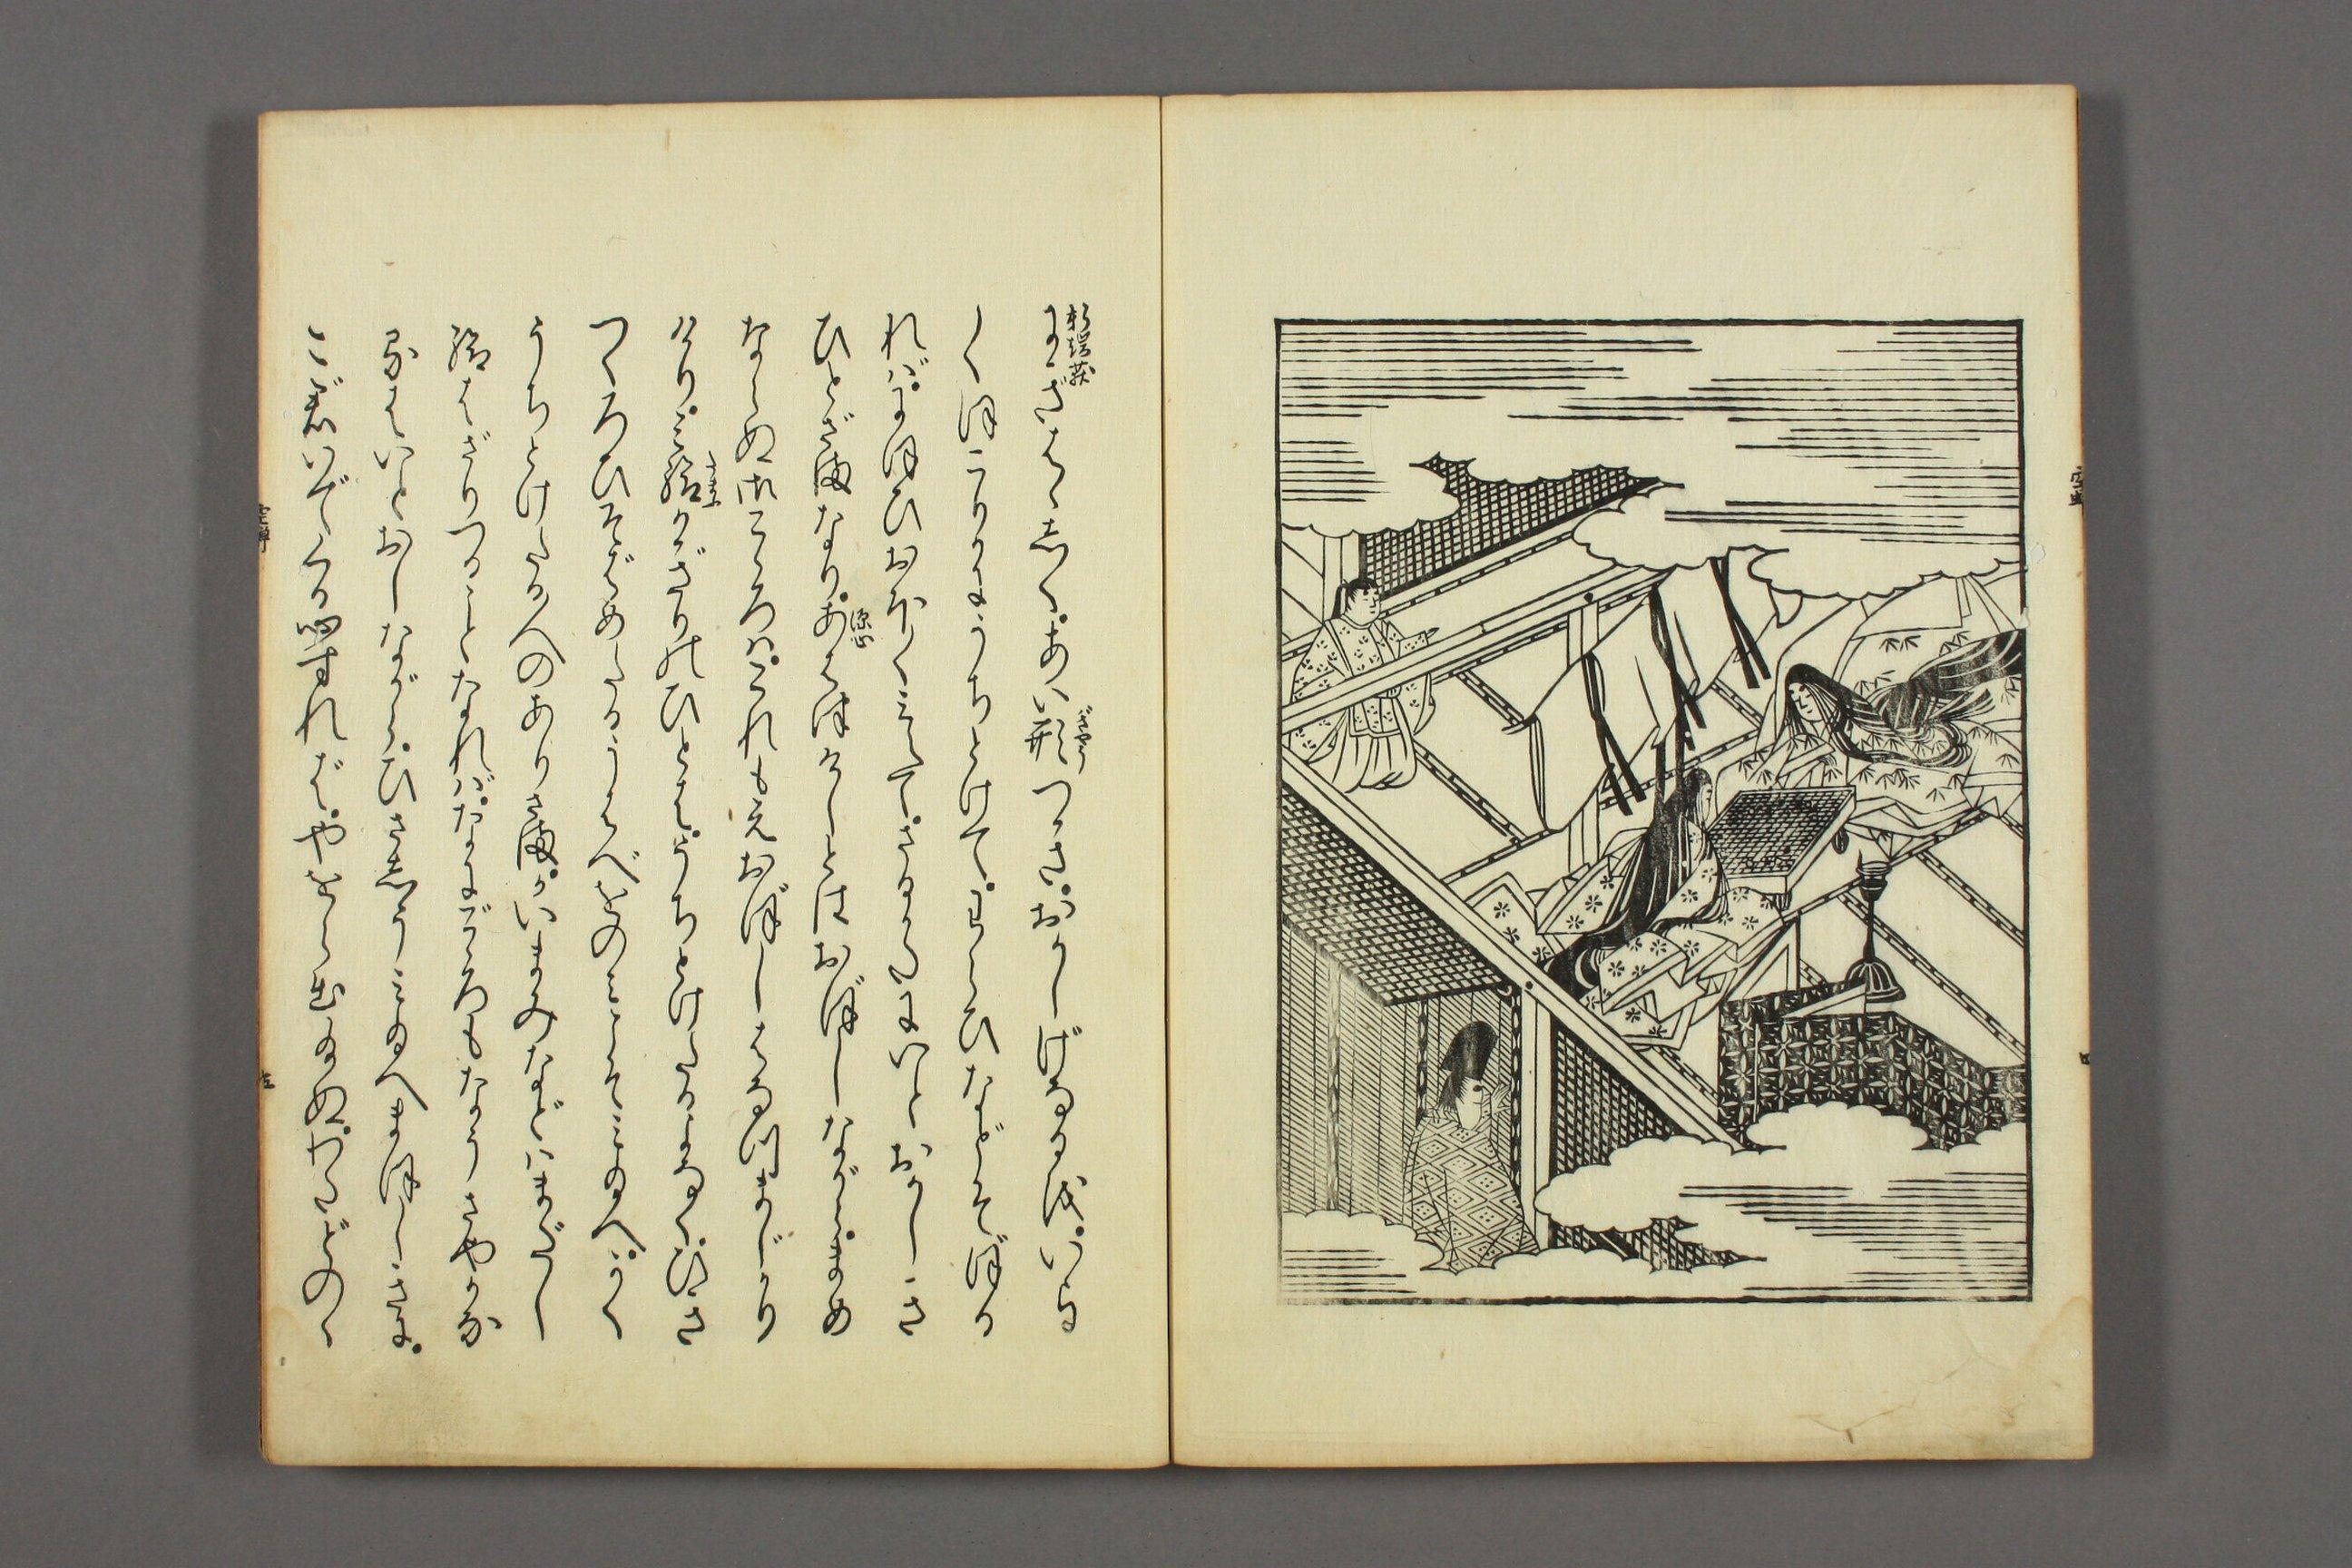 http://archive.wul.waseda.ac.jp/kosho/bunko30/bunko30_a0007/bunko30_a0007_0003/bunko30_a0007_0003_p0006.jpg